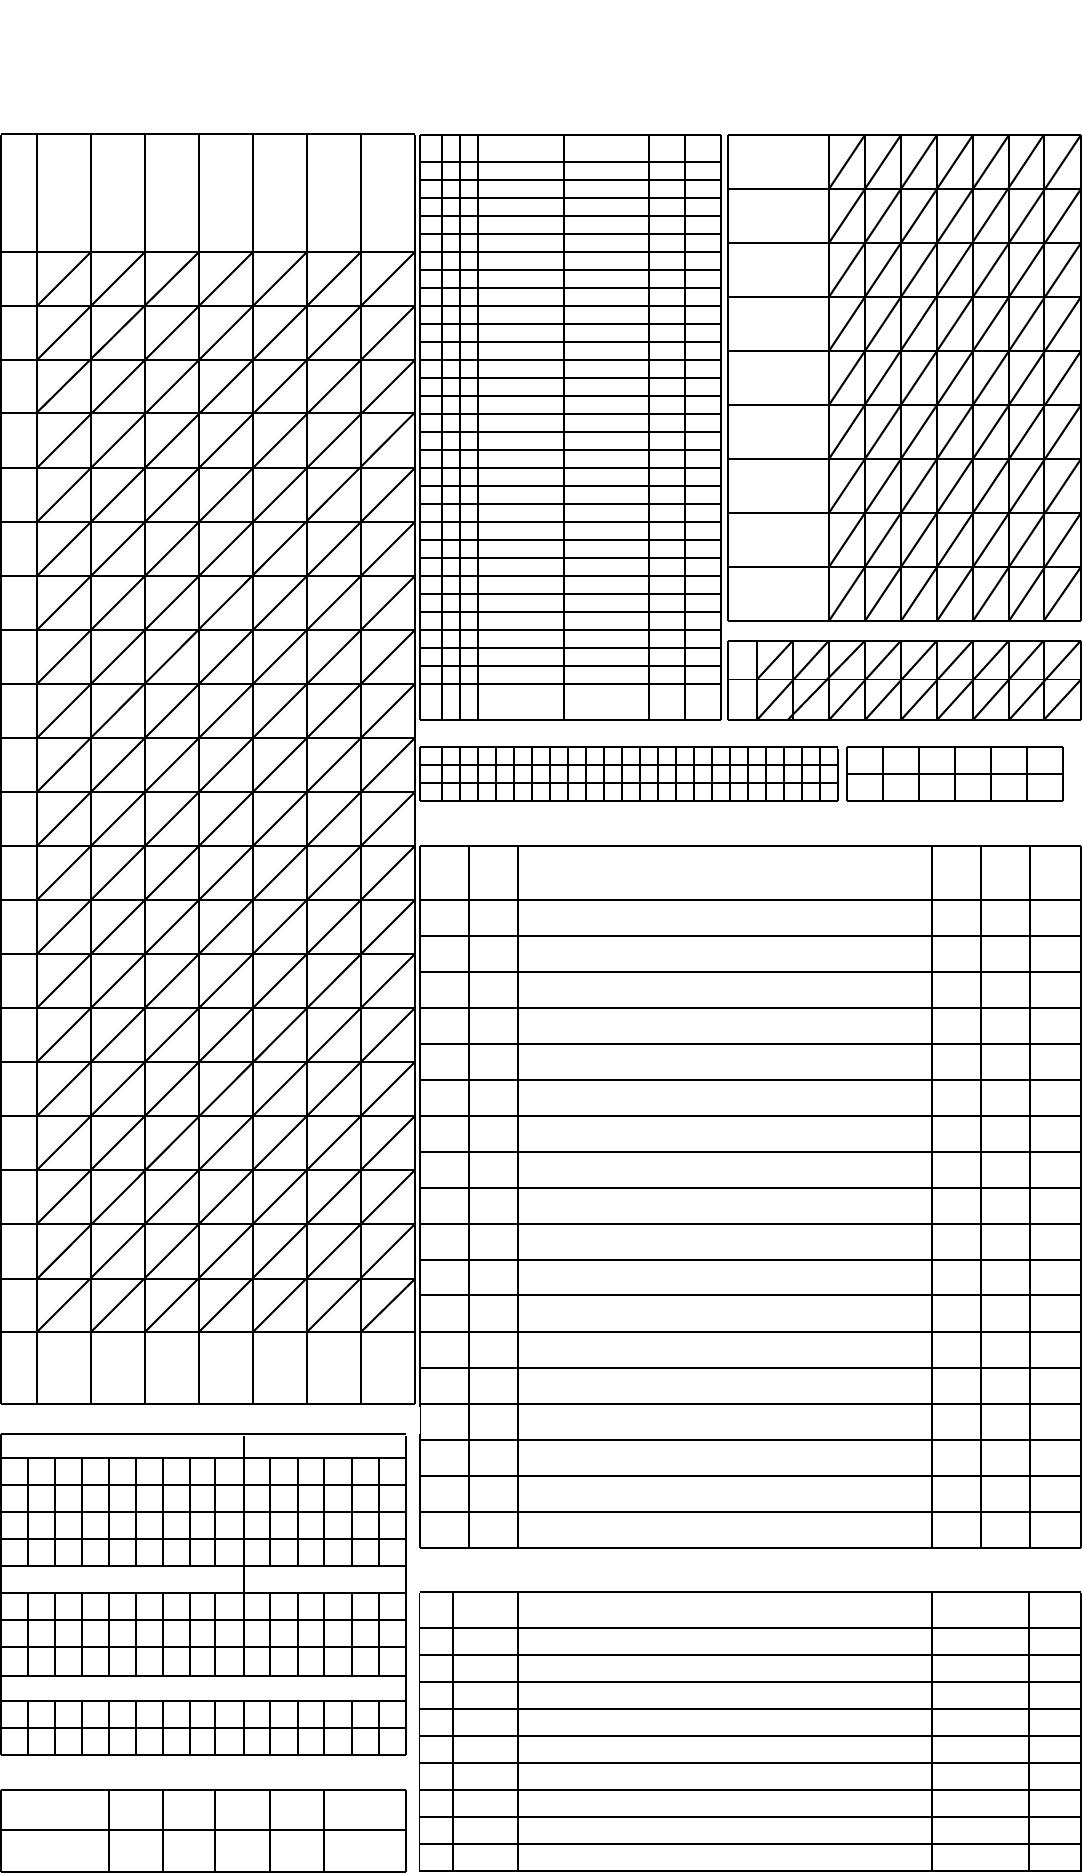 Softball Score Sheet Template Excel - Laobing Kaisuo - Free Printable Softball Stat Sheets